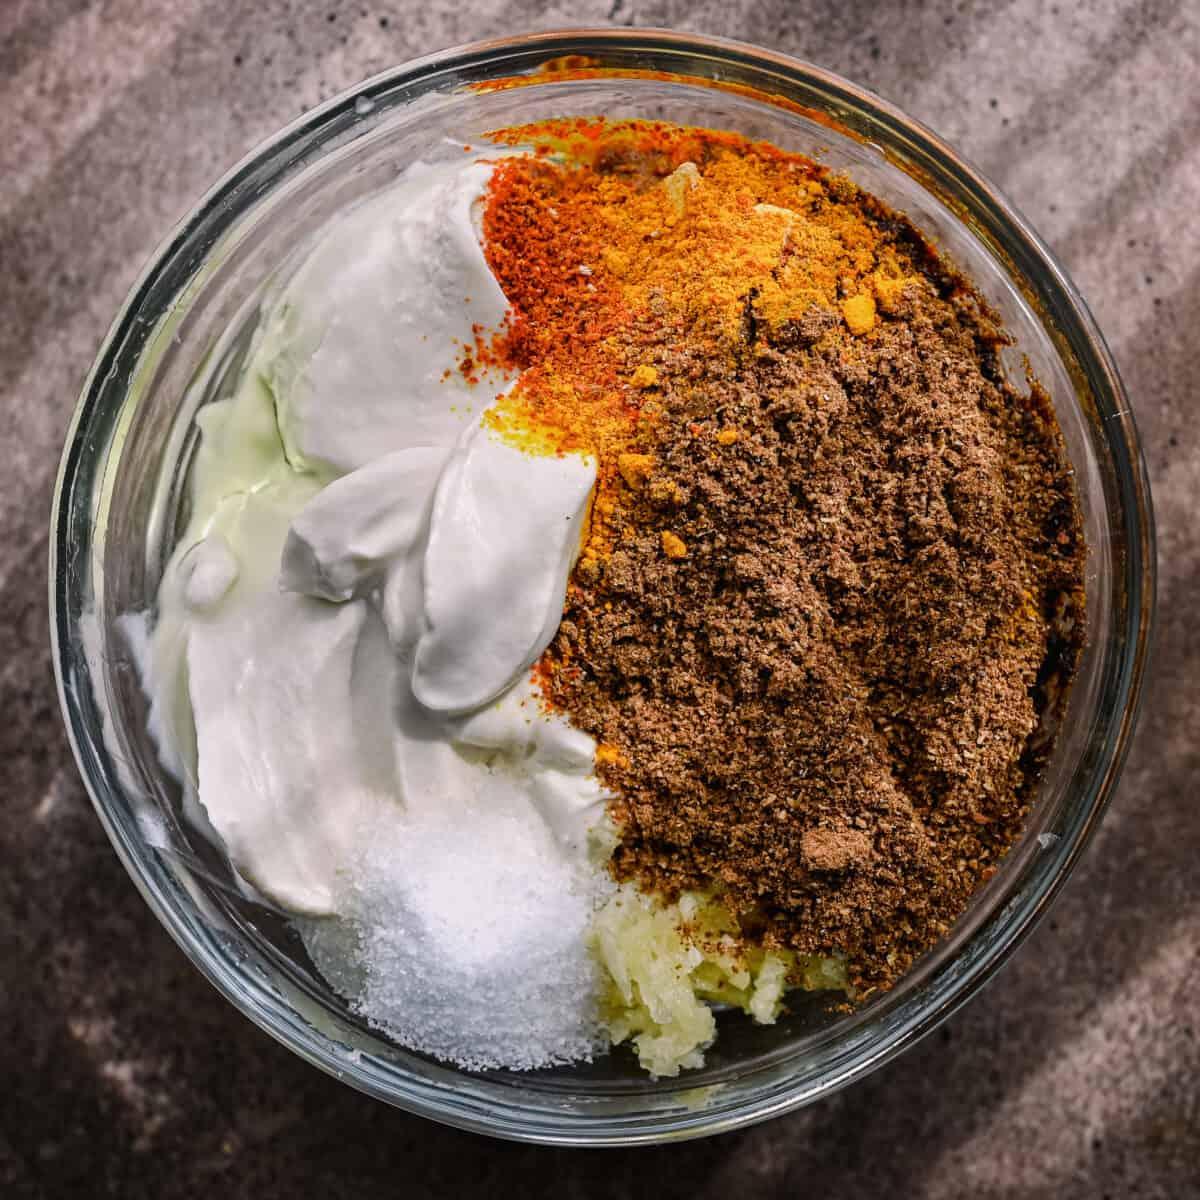 tofu tikka marinade with spices, yogurt, garlic, and ginger in a bowl